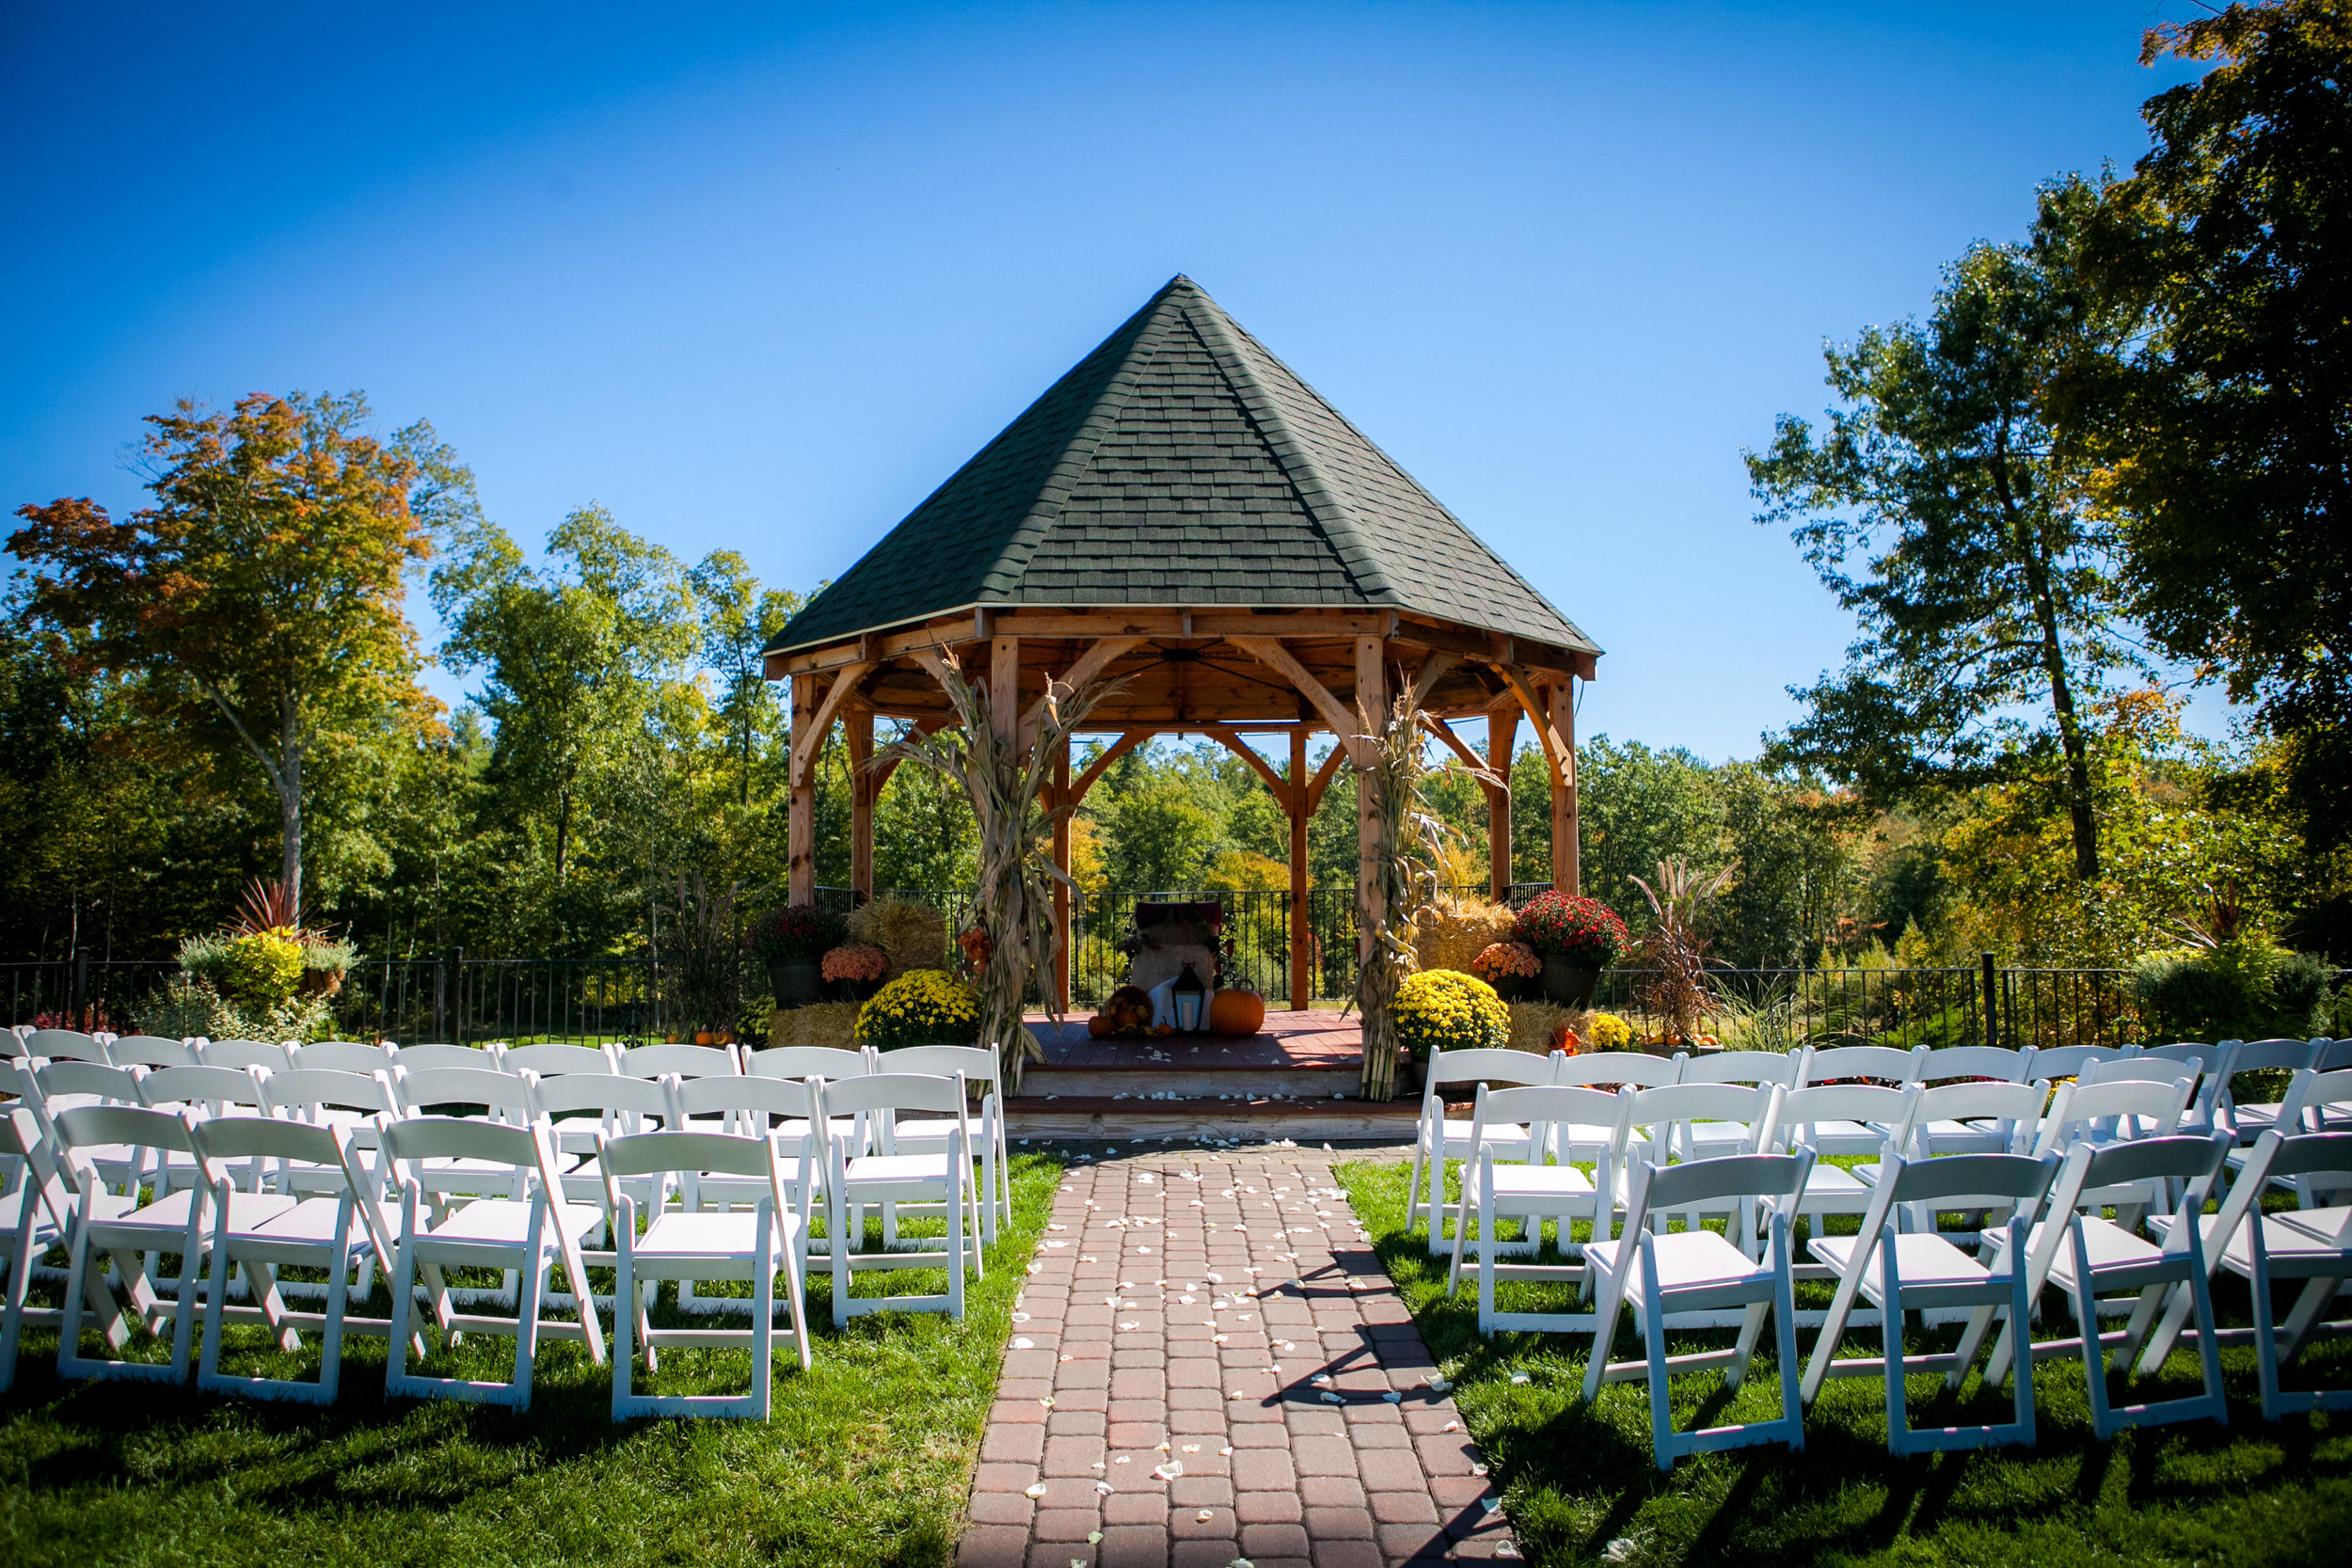 zorvino_sandown_NH_wedding_photography-3.jpg